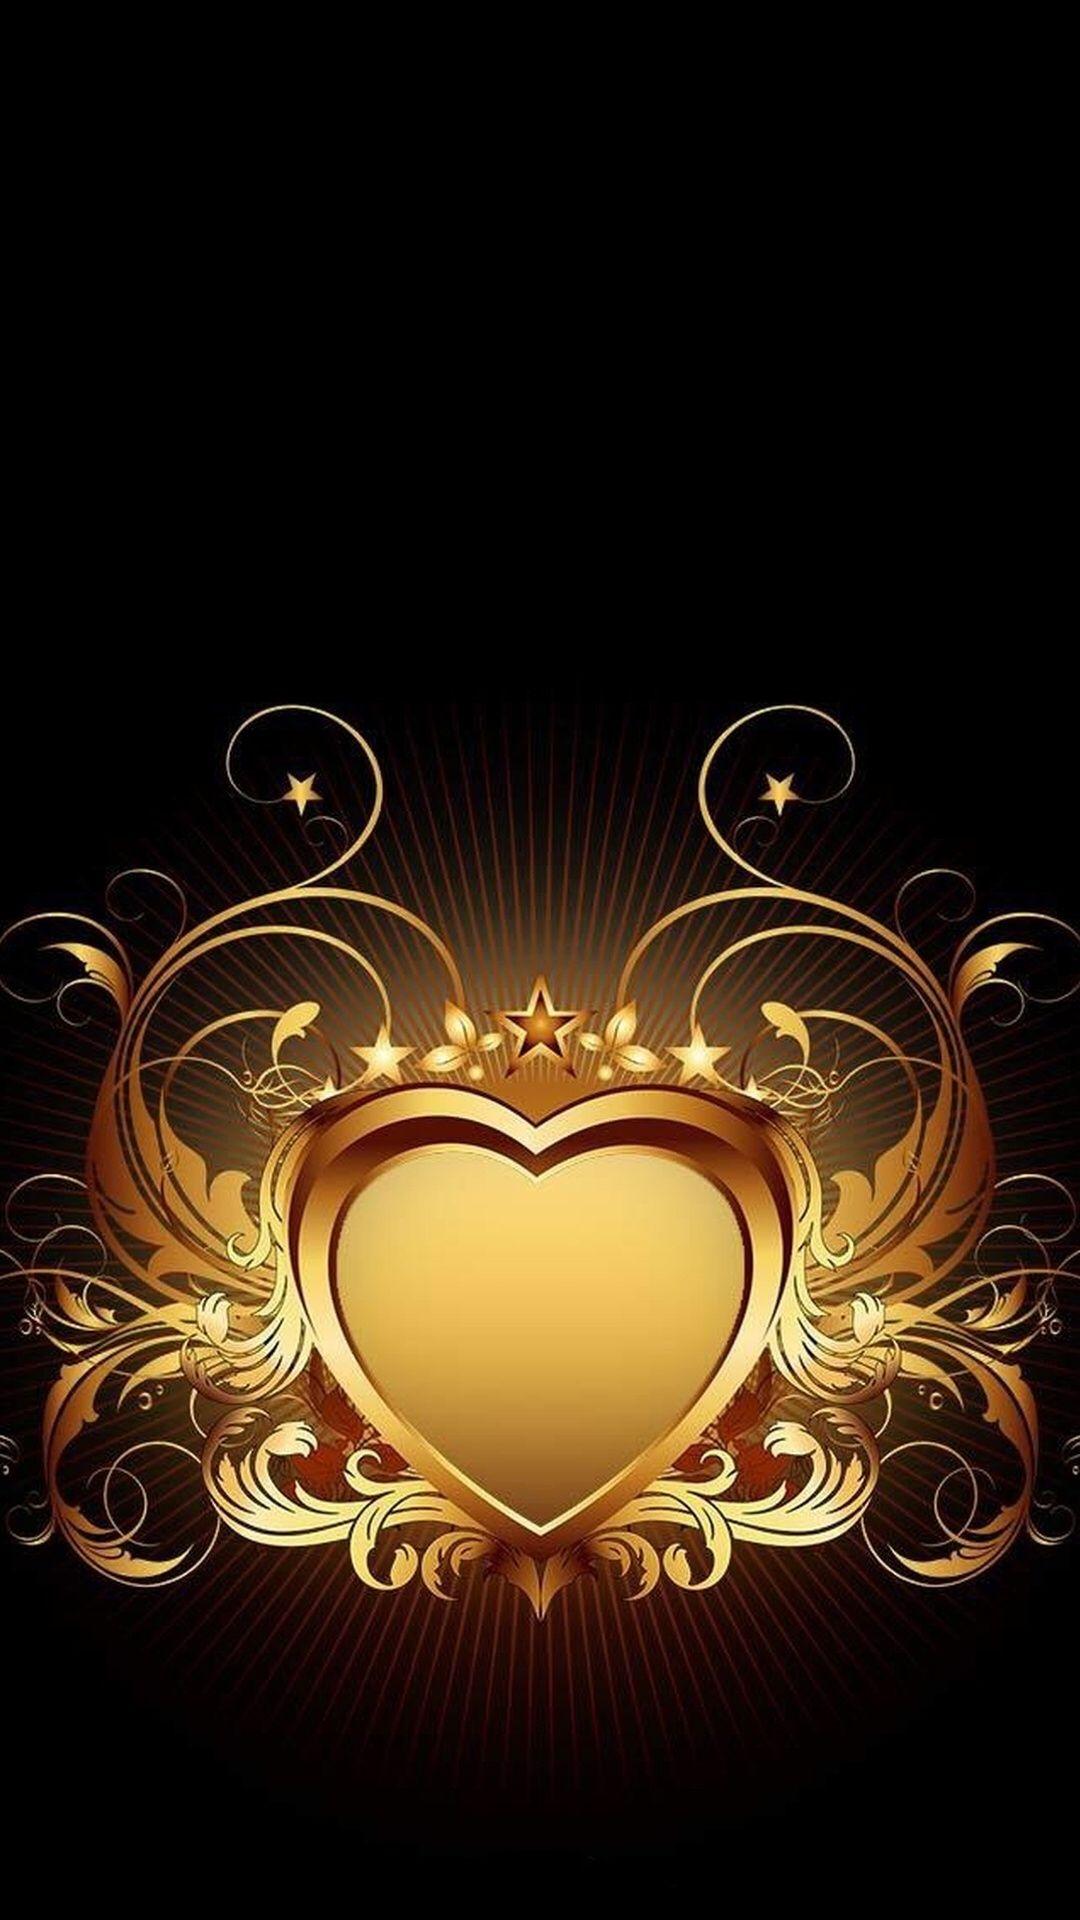 Fantastic Wallpaper Love Zedge - 57b2892b8c386c782c93b0024b11cf38  Photograph_65117.jpg